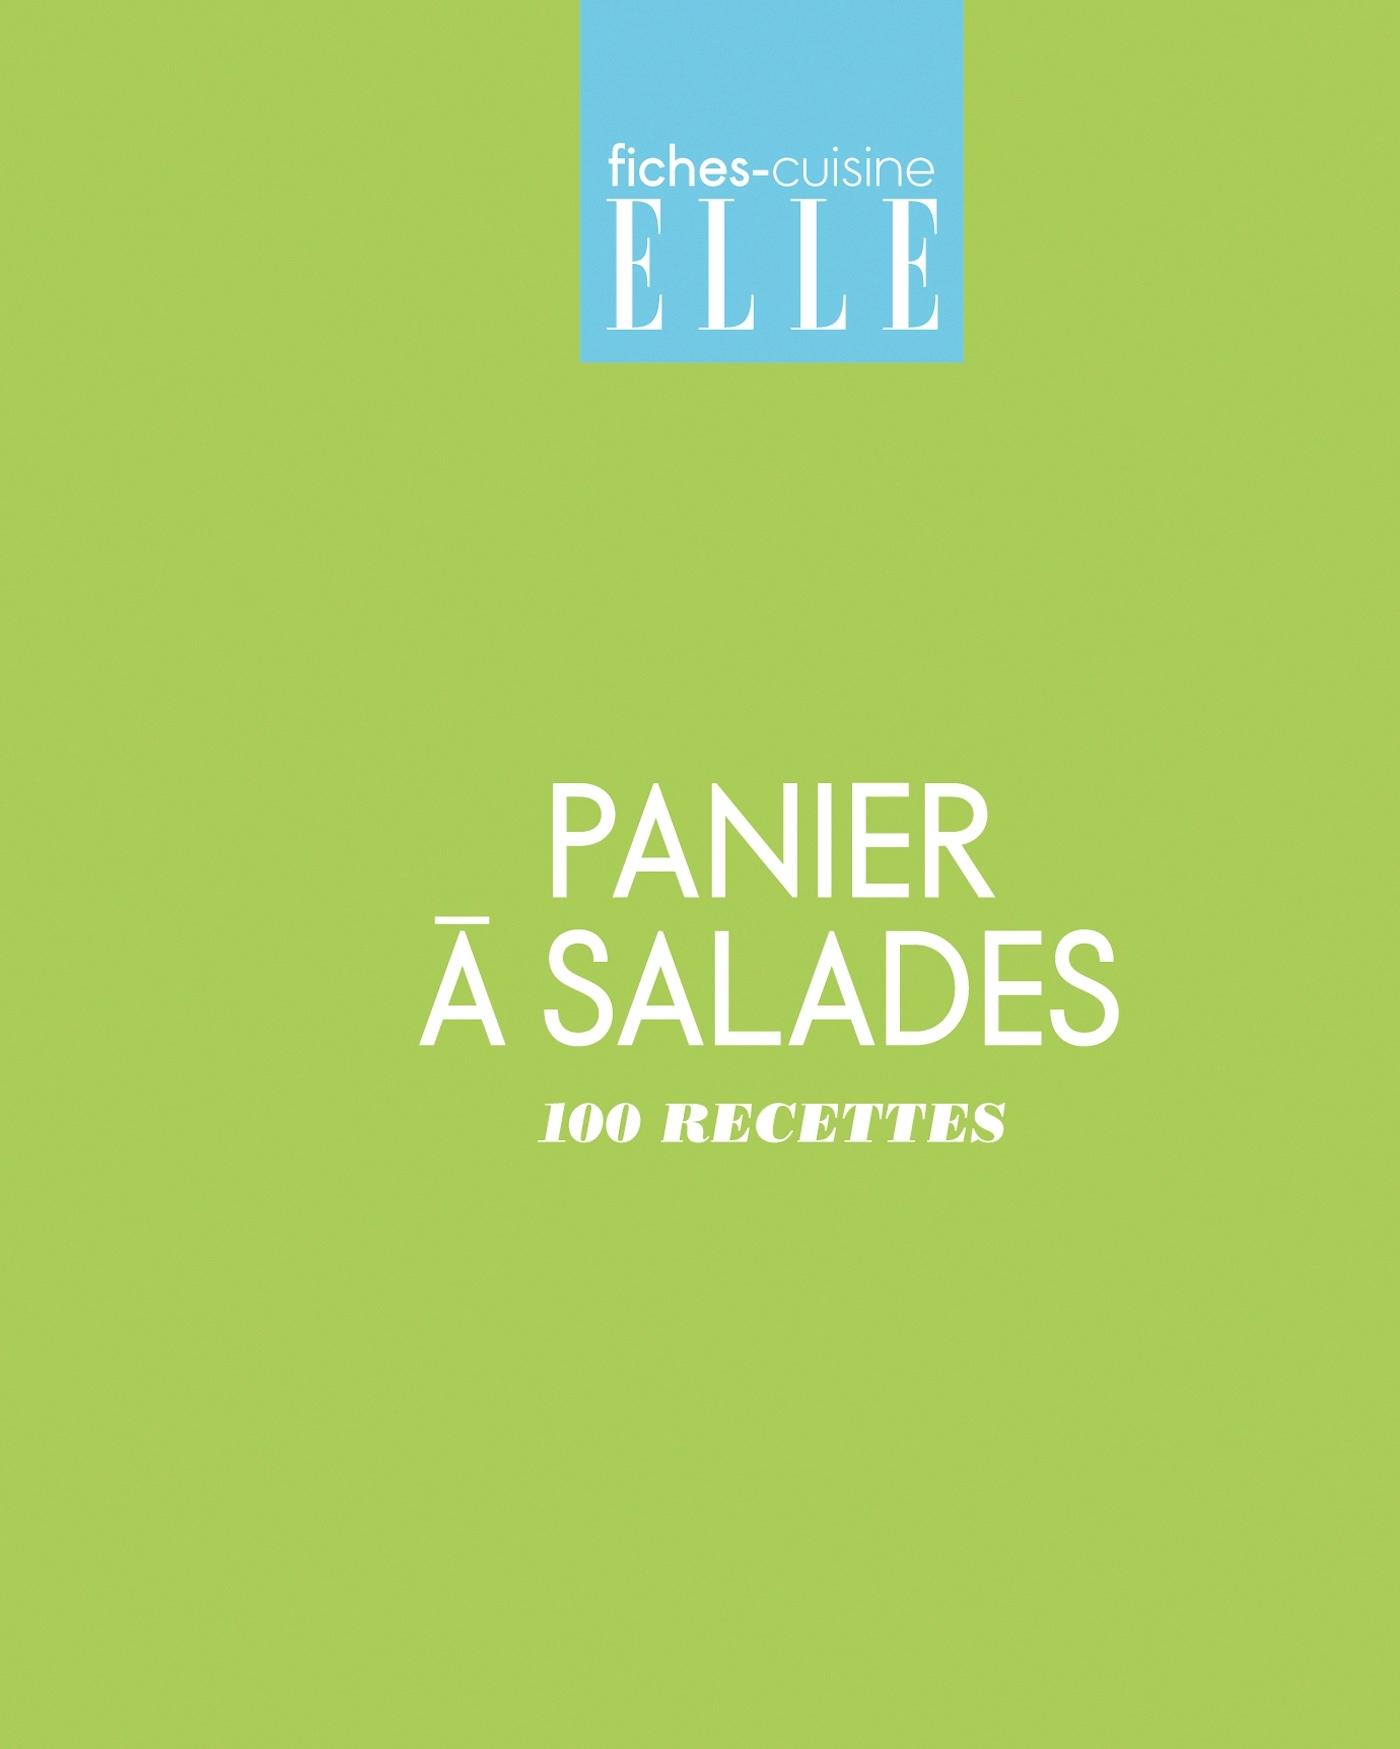 PANIER A SALADES